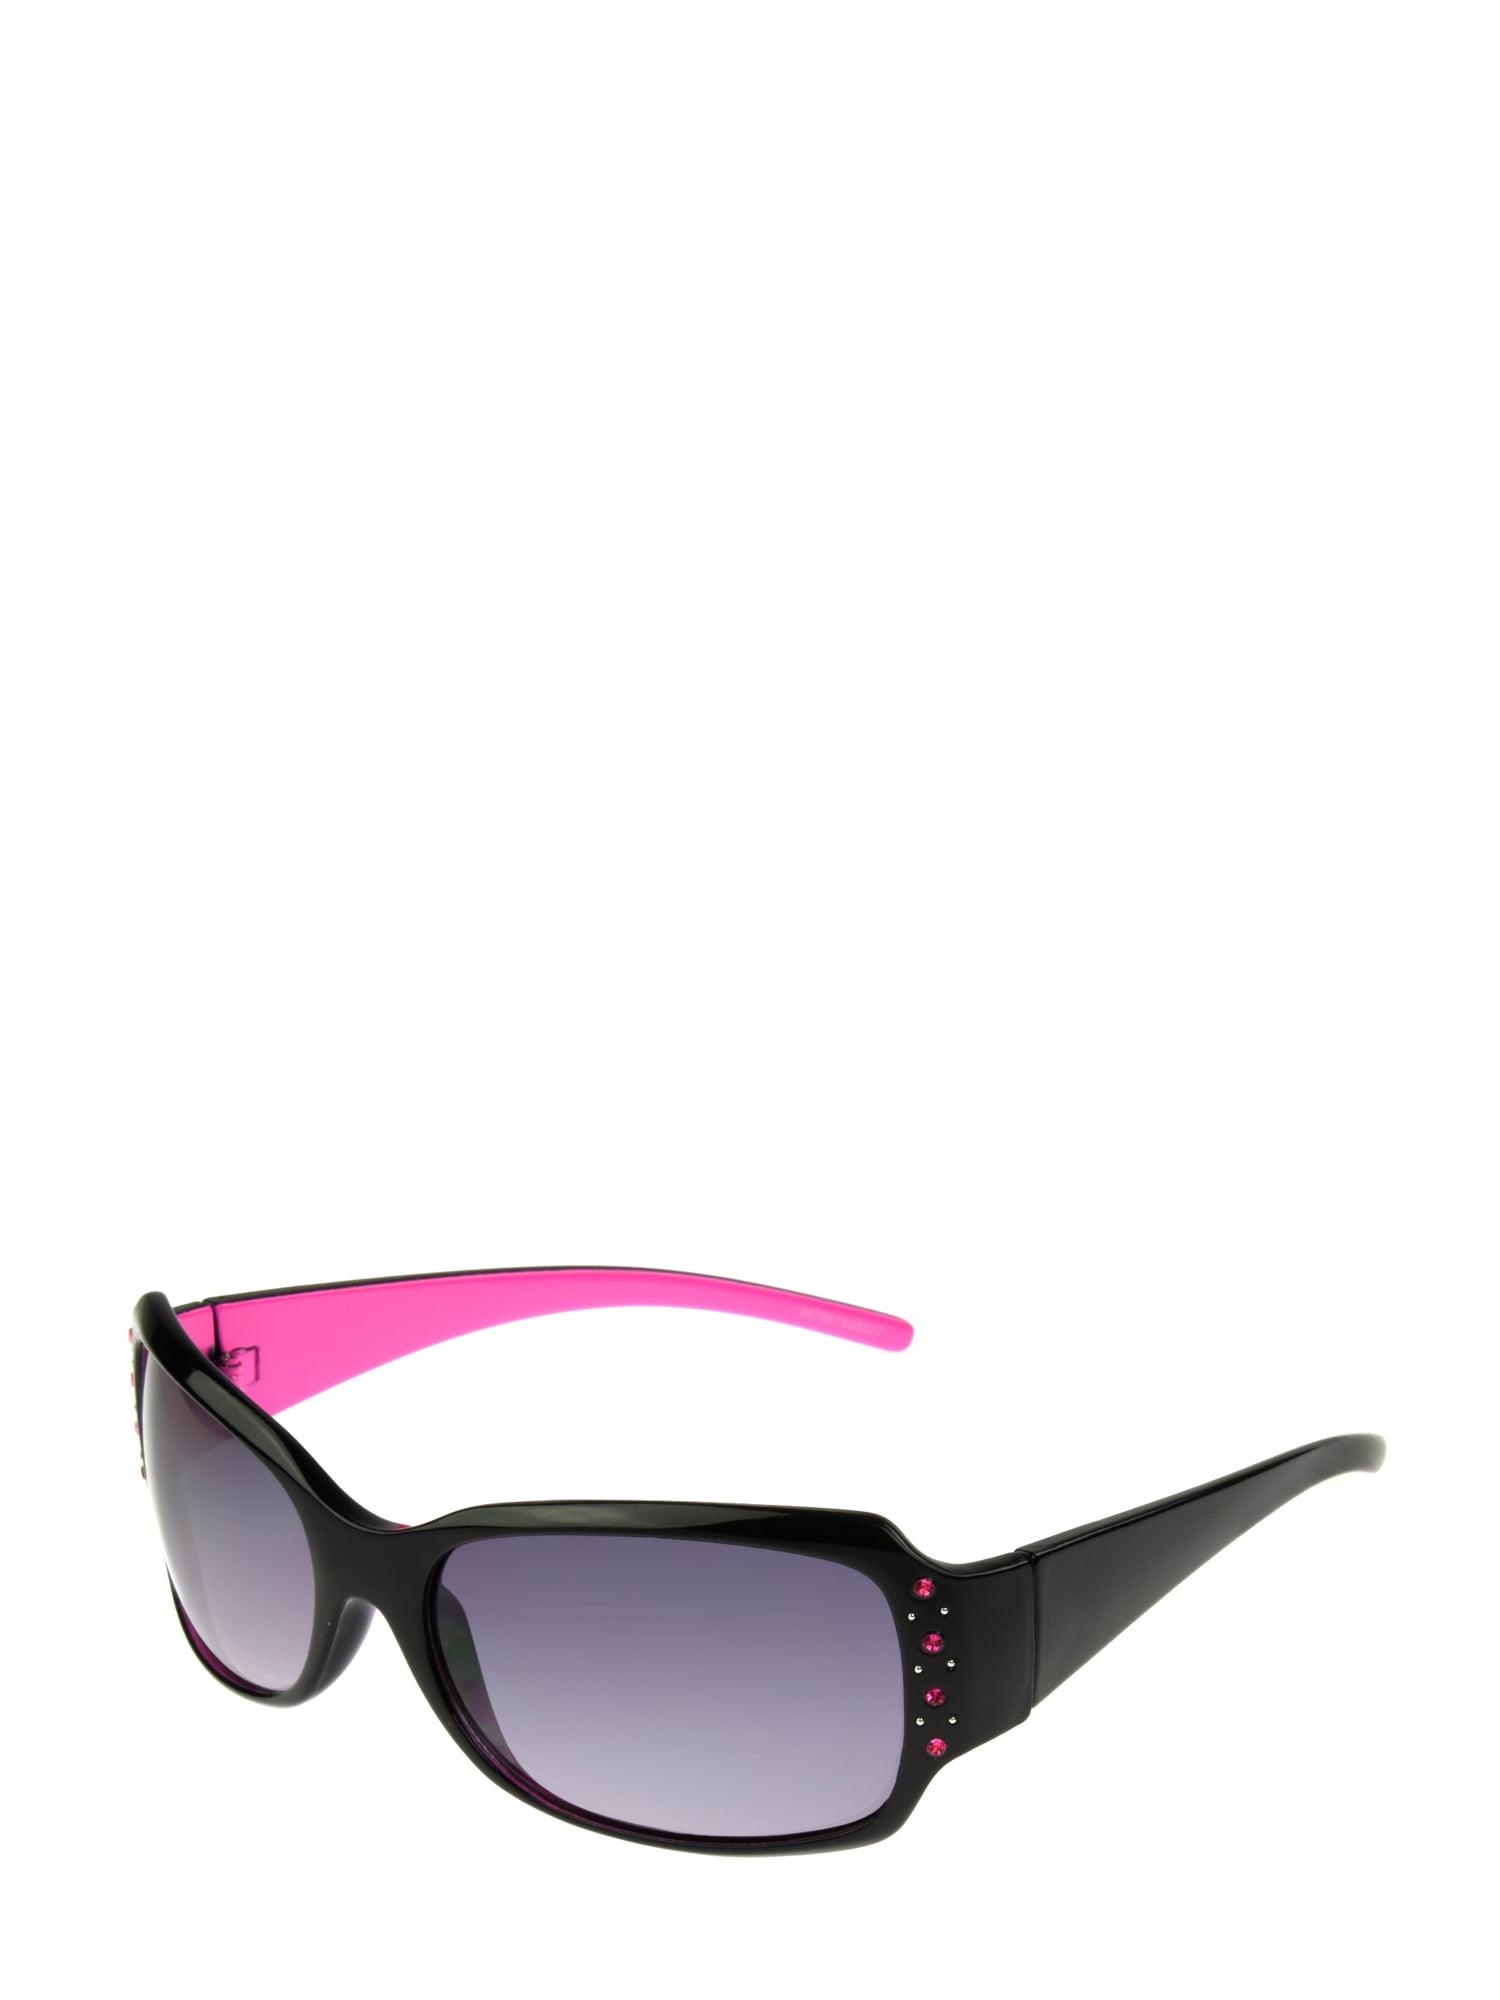 1b547a907c185 Women s Wrap 1 Sunglasses – Walmart Inventory Checker – BrickSeek